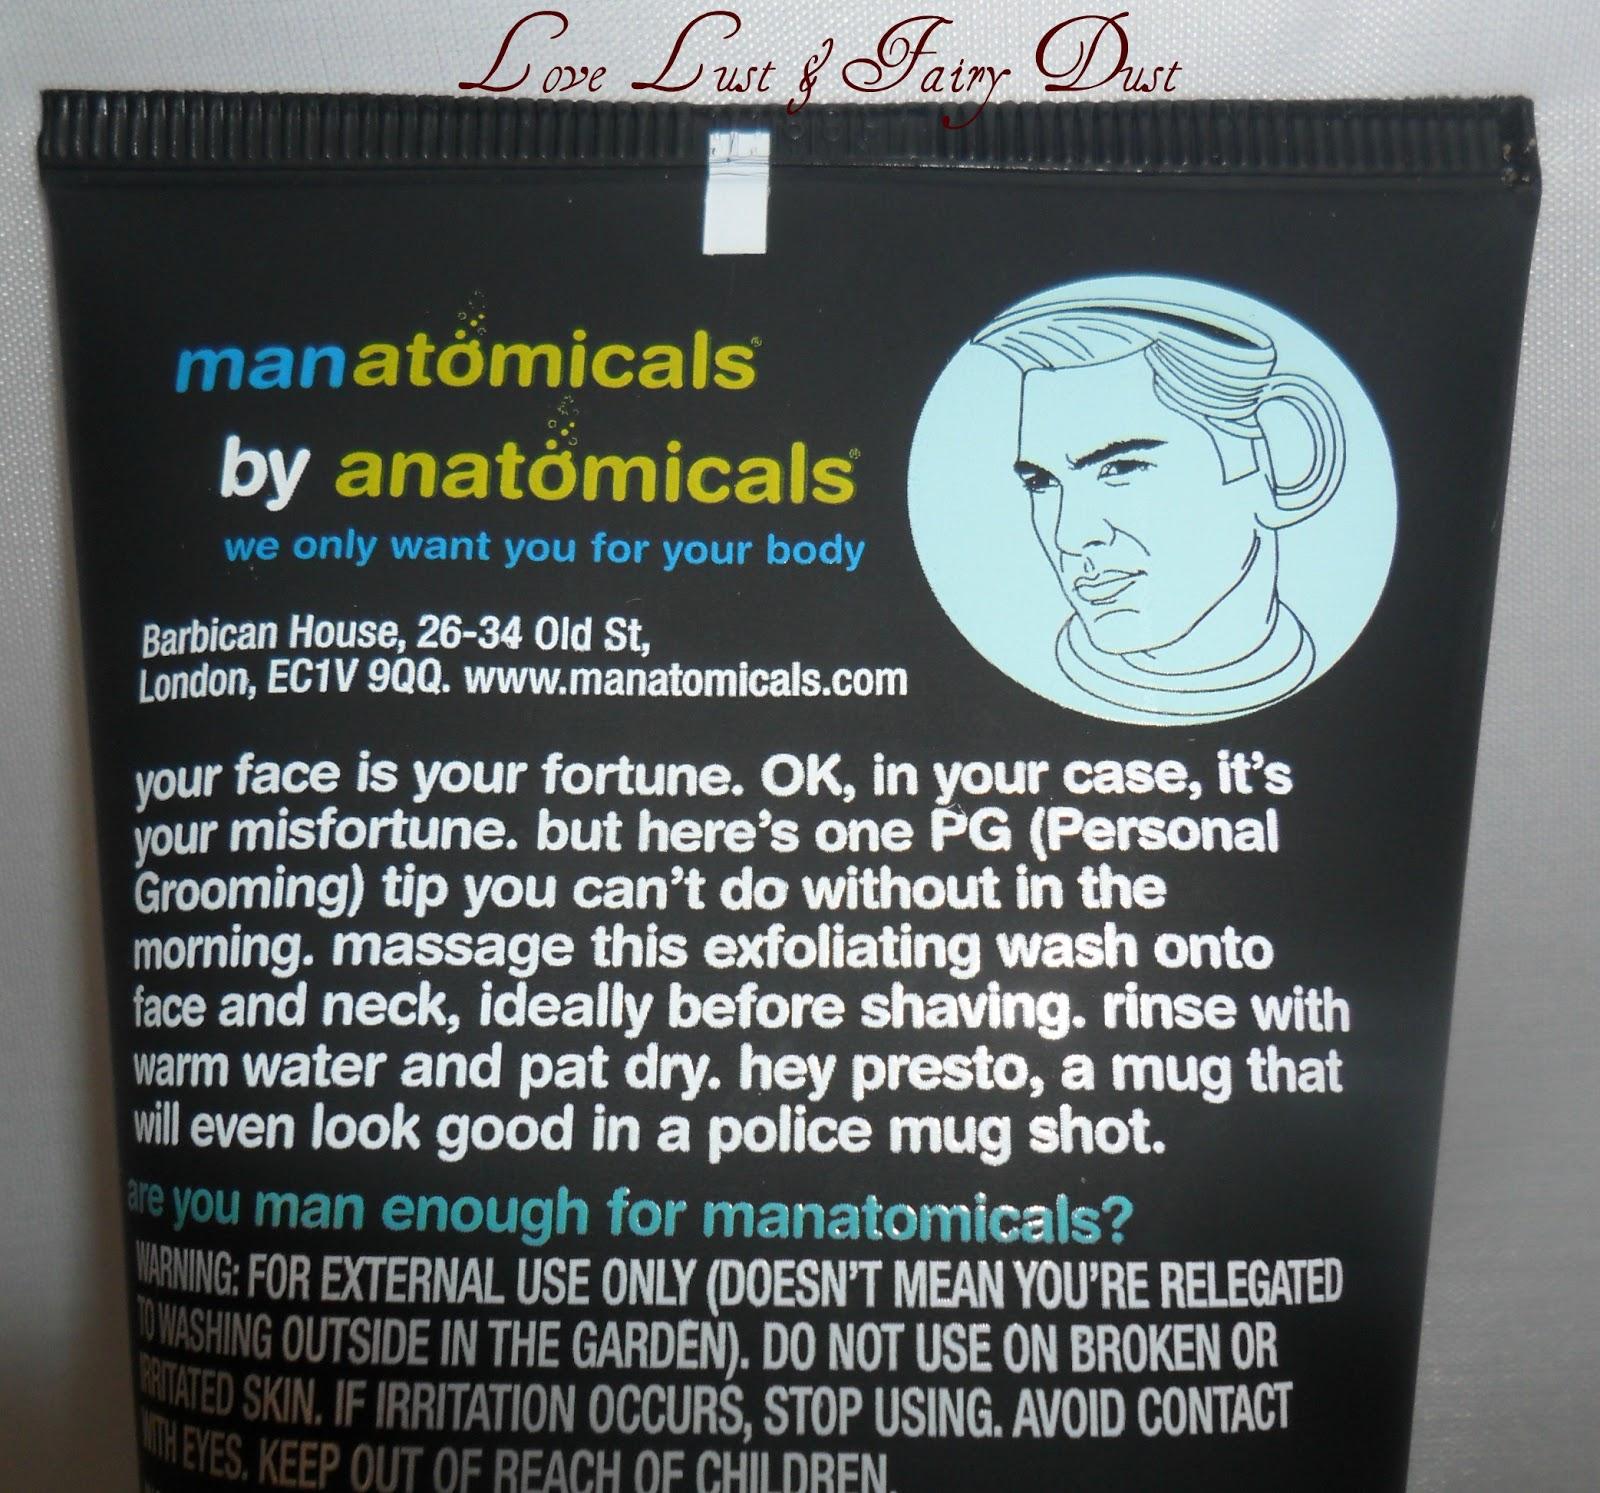 Manatomicals